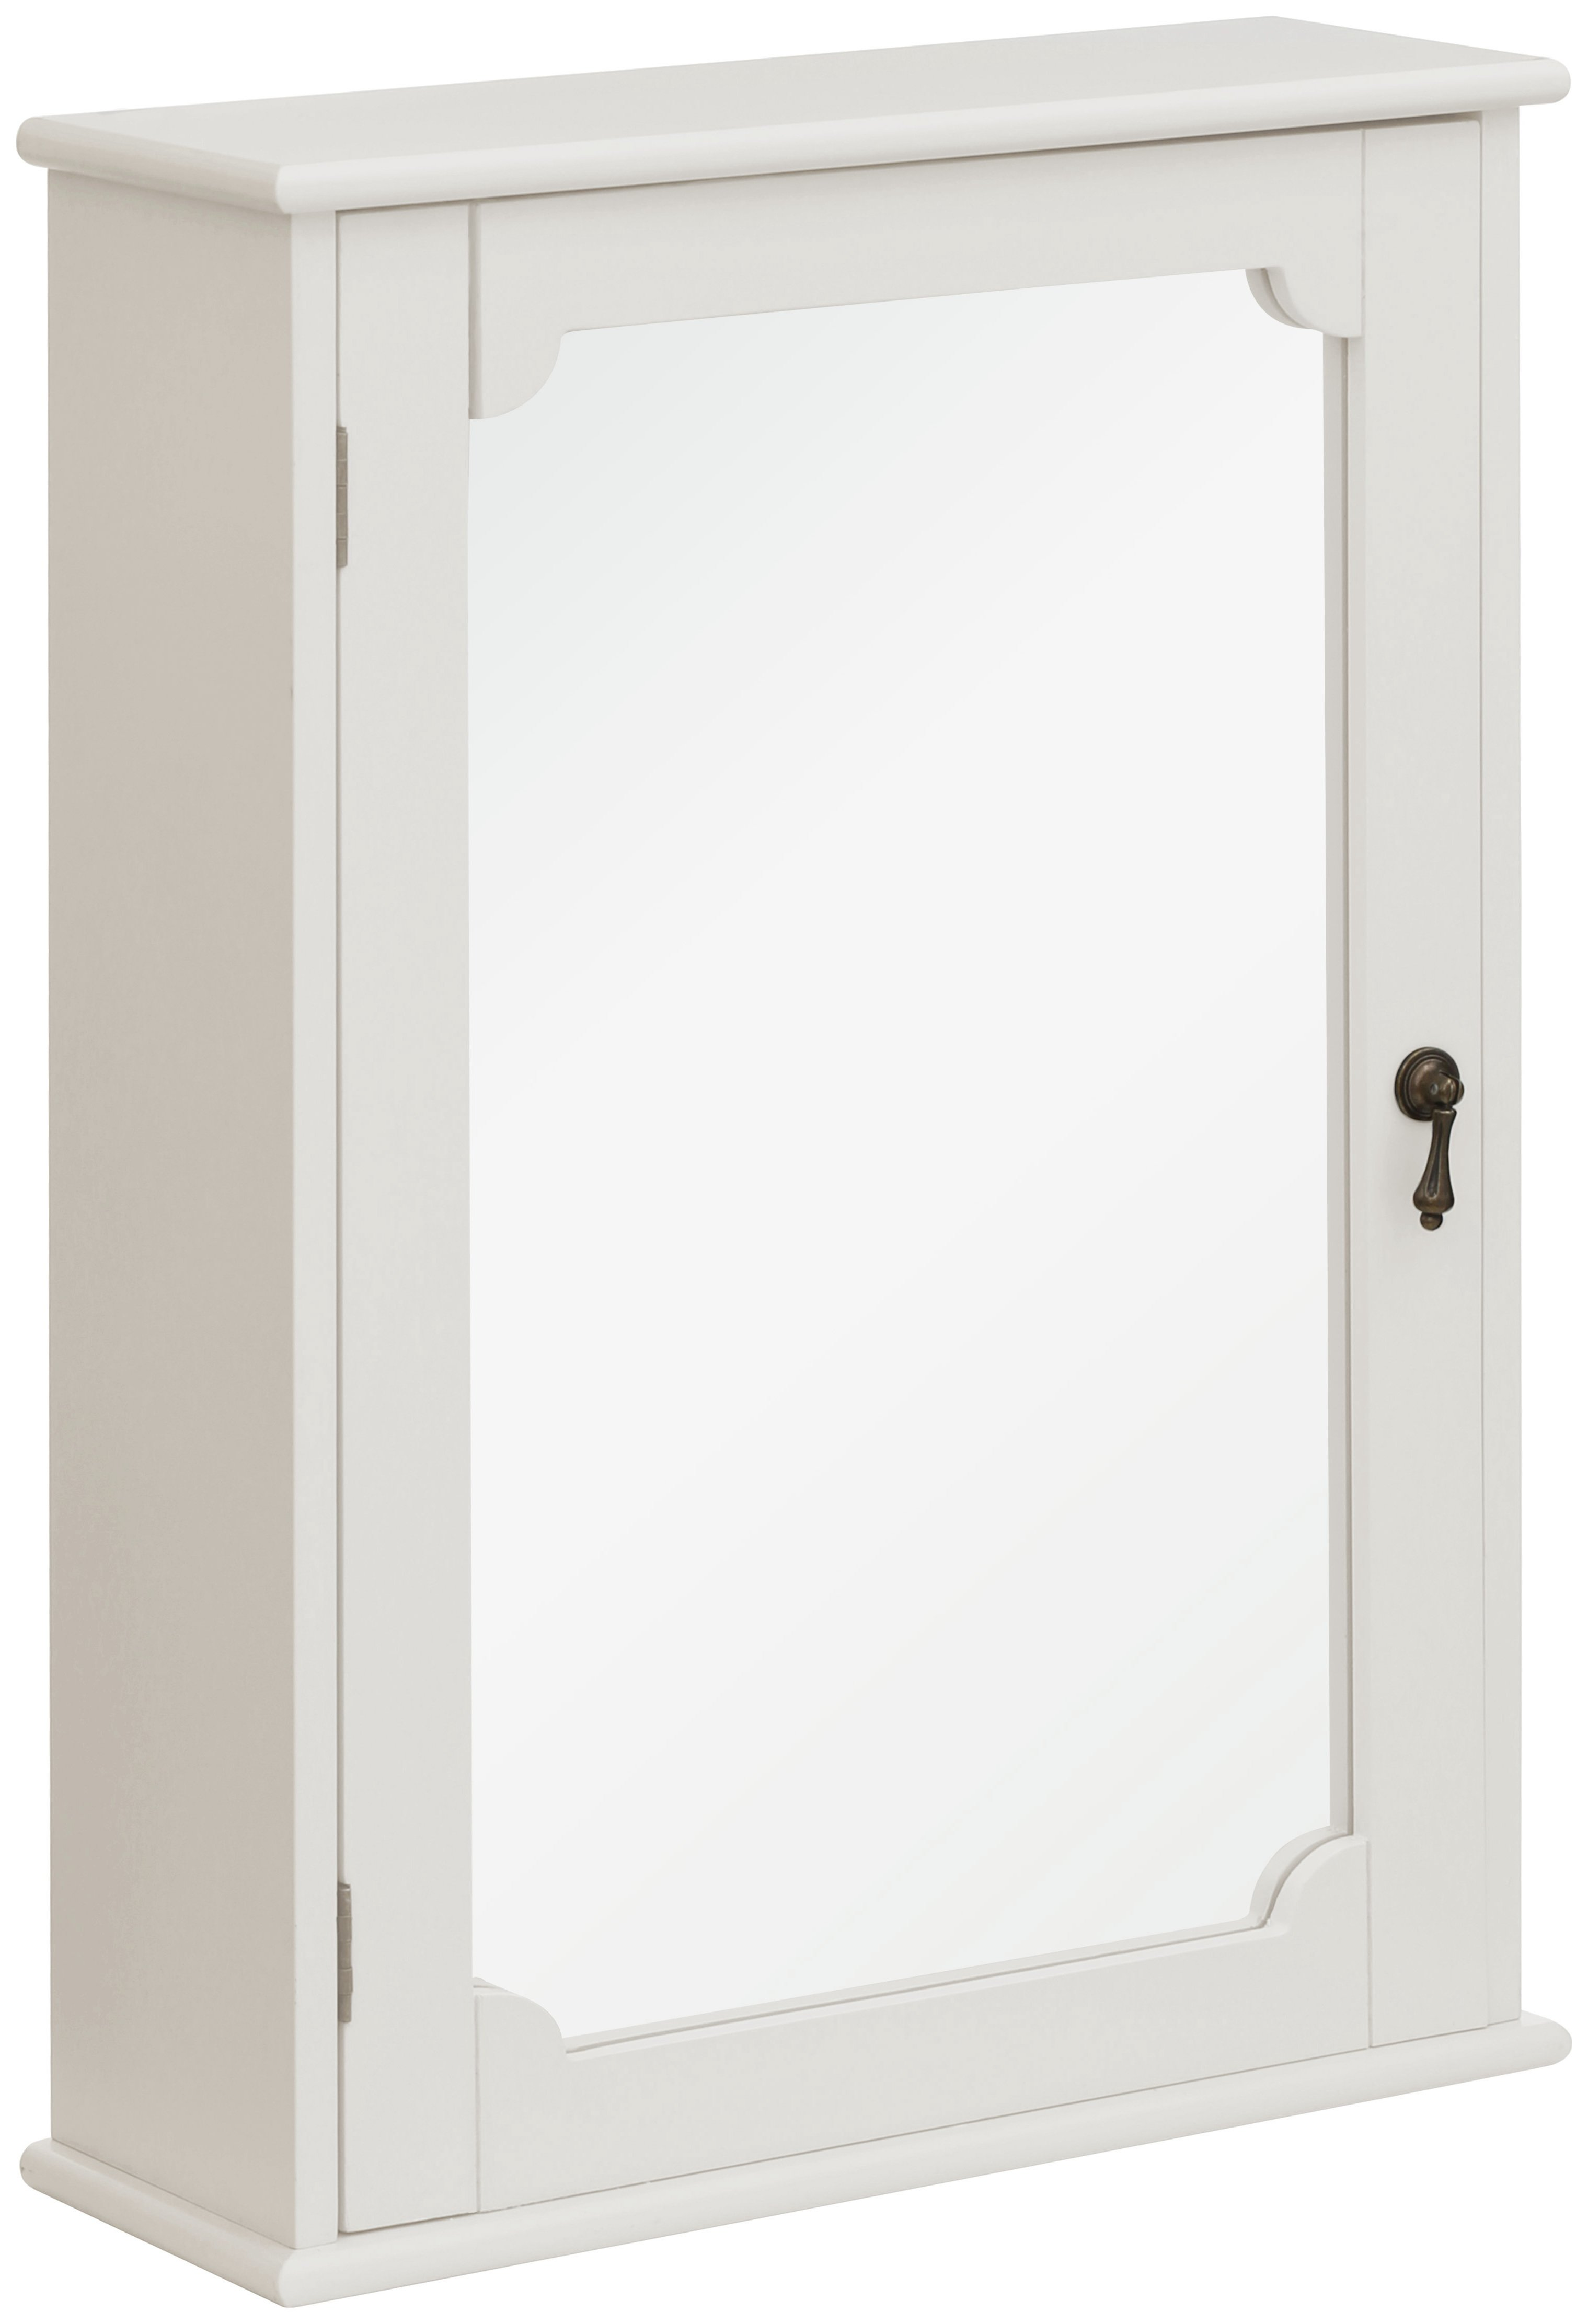 Bathroom cabinets | Page 7 | Argos Price Tracker | pricehistory.co.uk